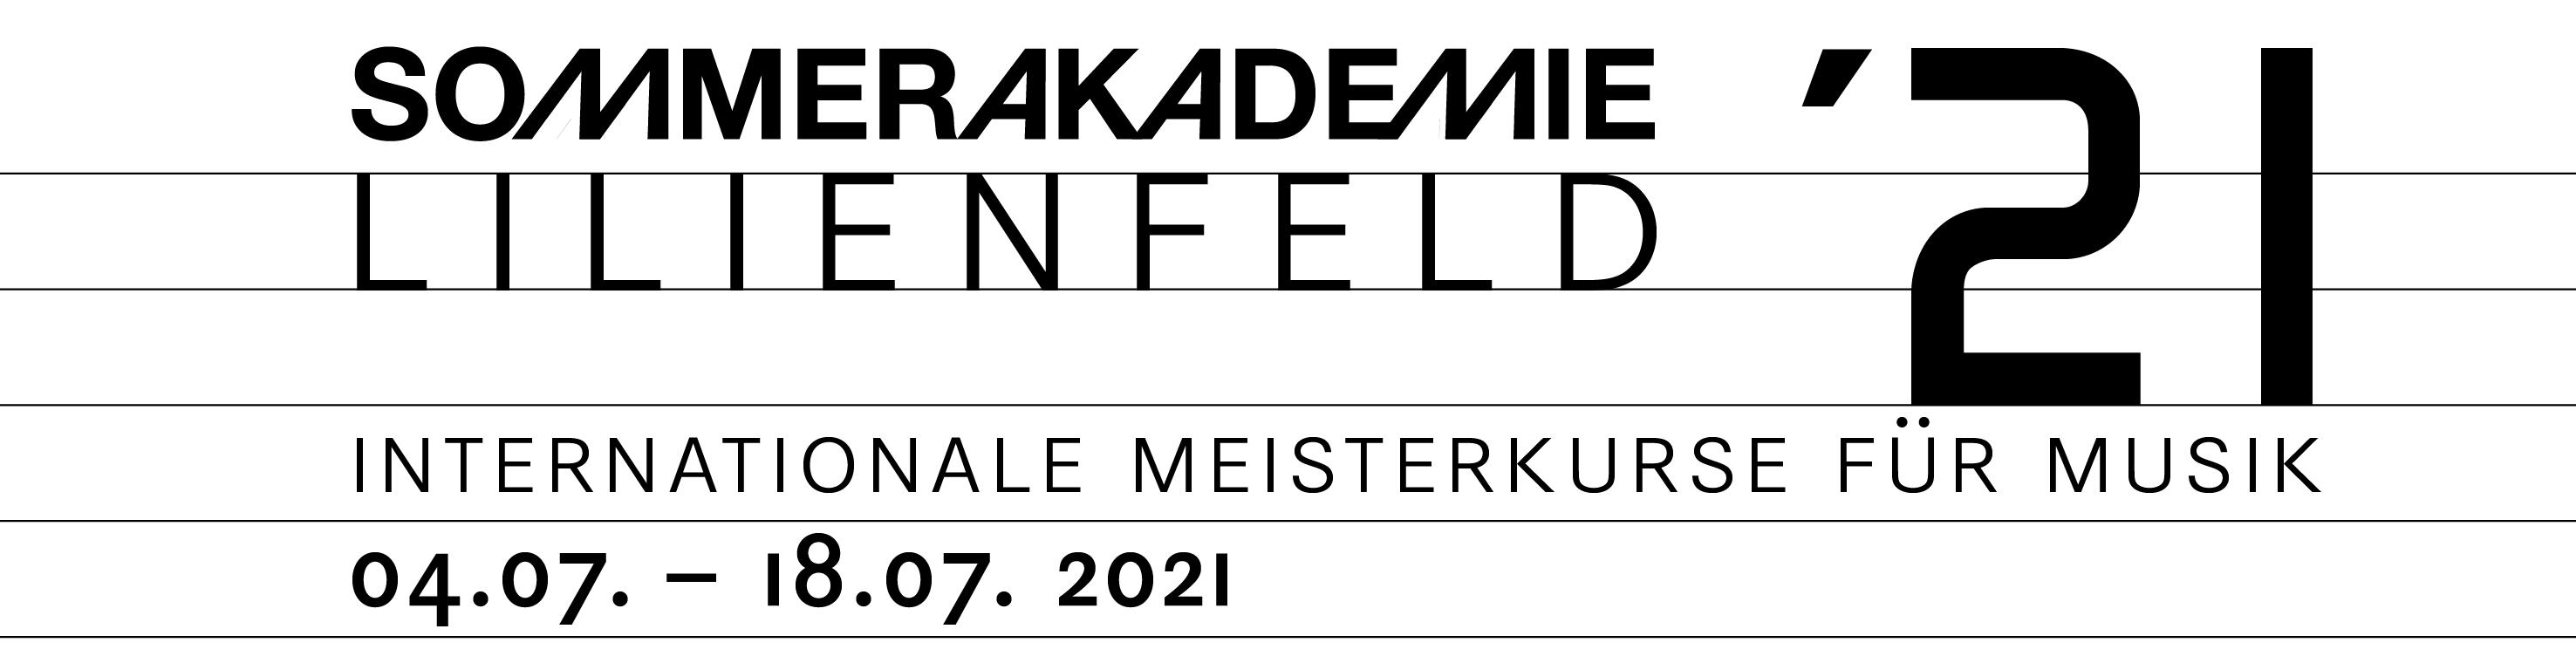 Logo Sommerakademie Lilienfeld 2020